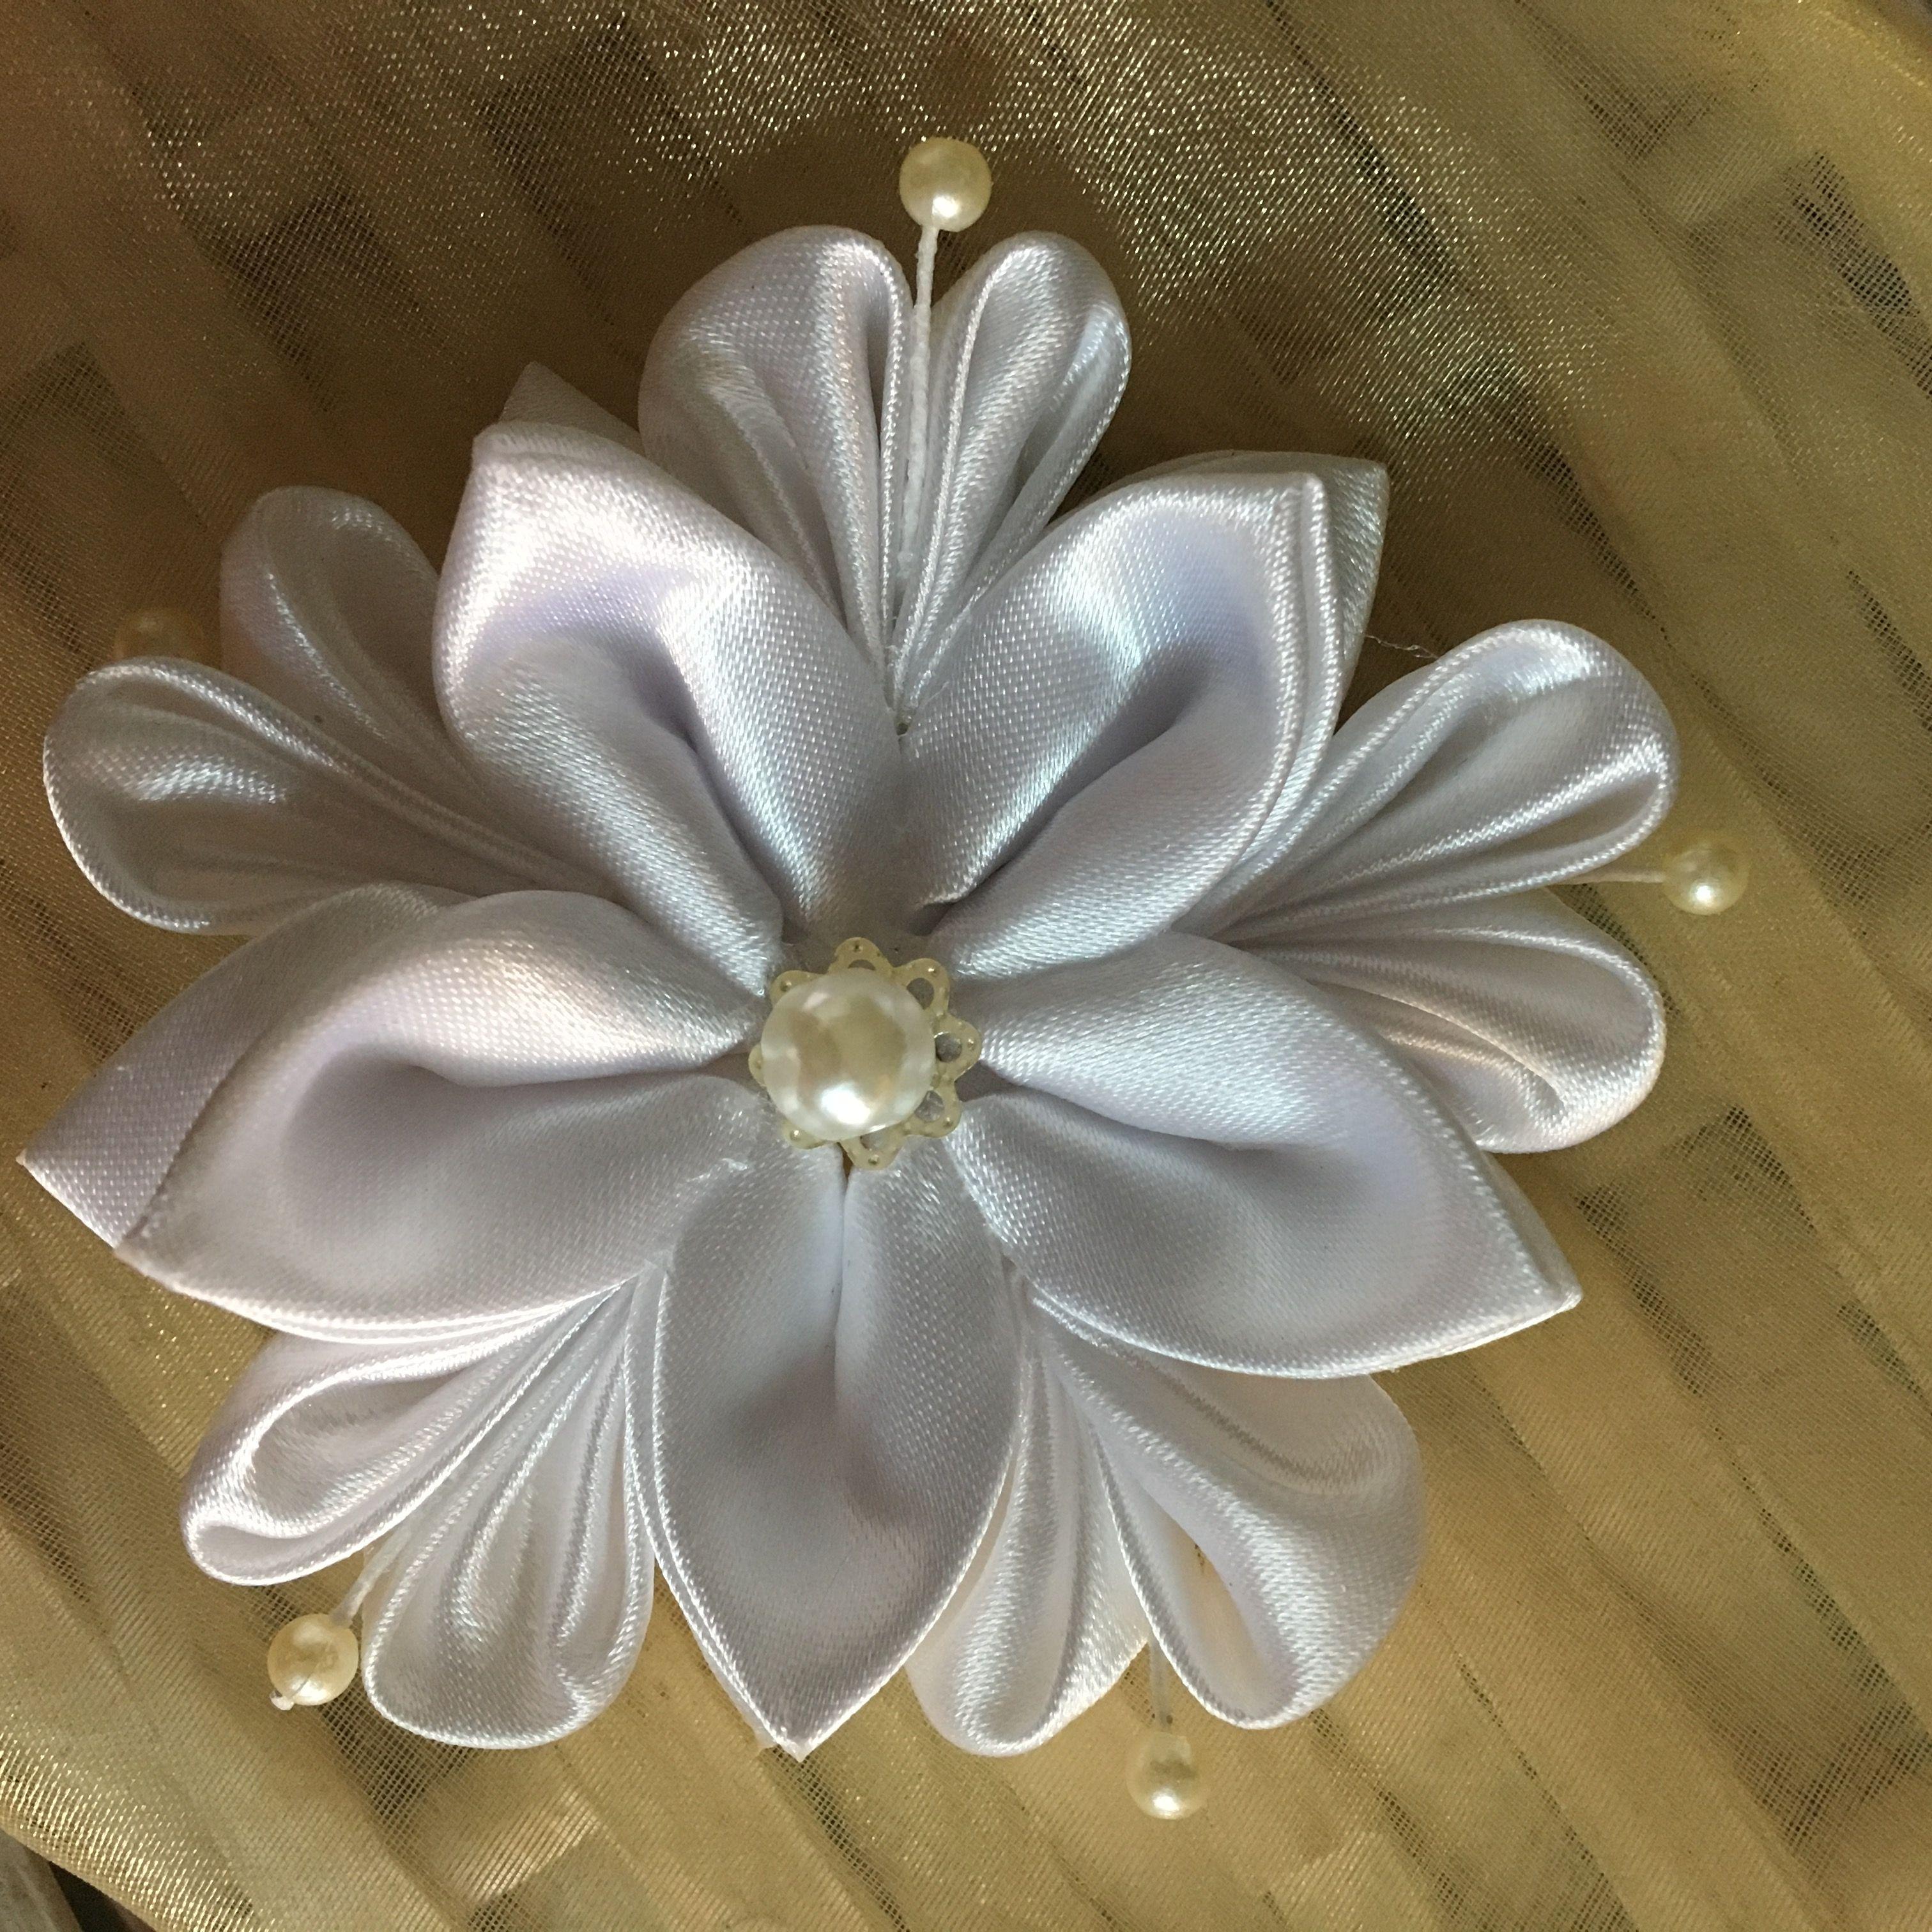 Pin by Natalia Tibiletti on My Kanzashi Flowers